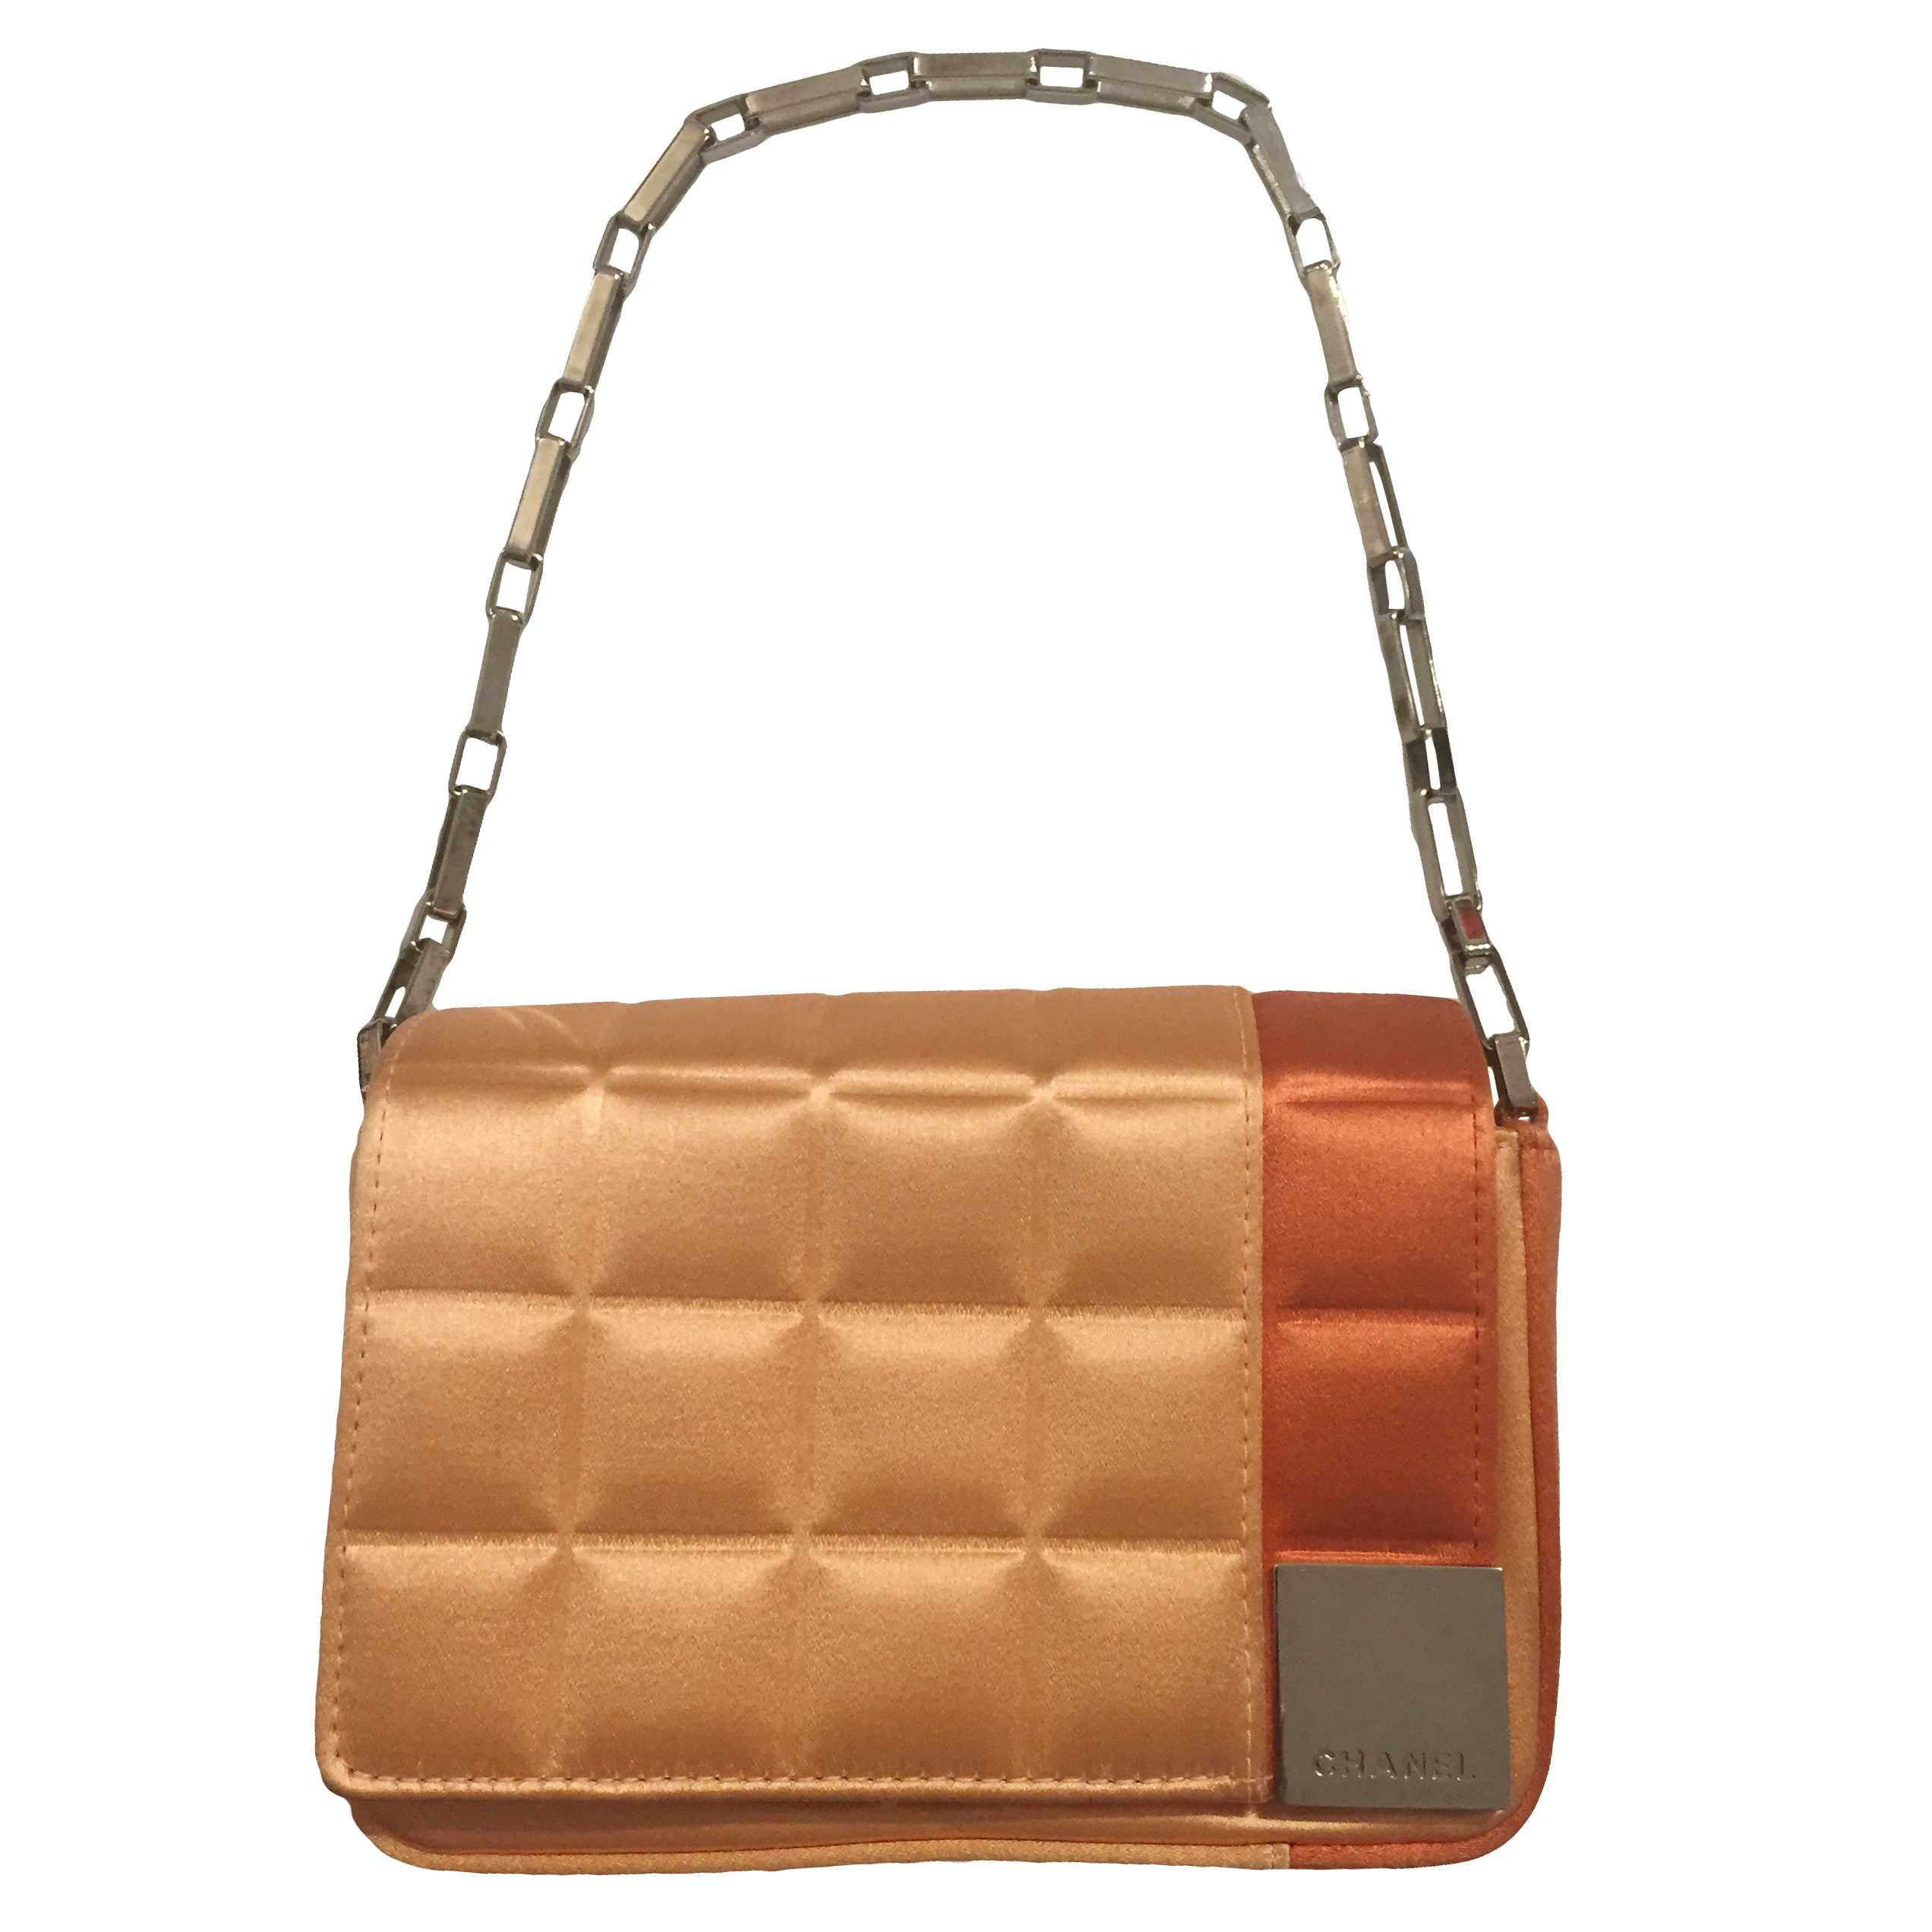 05ecc69f6ad1 Chanel Satin Chocolate Box Handbag   HEWI London